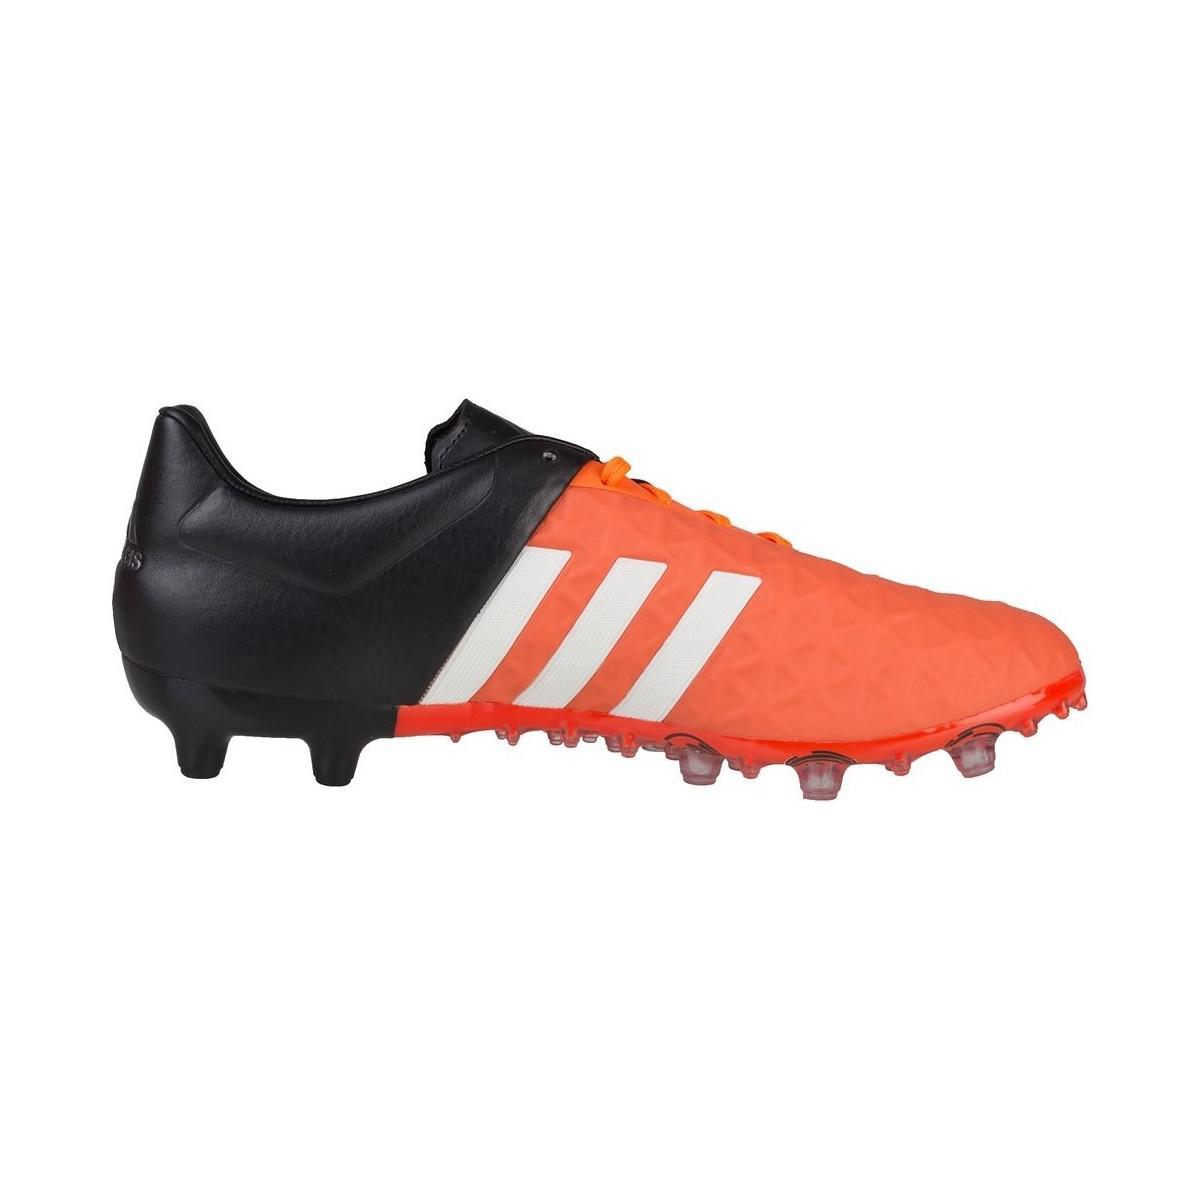 adidas. Ace 152 Fgag Men's Football Boots In Orange